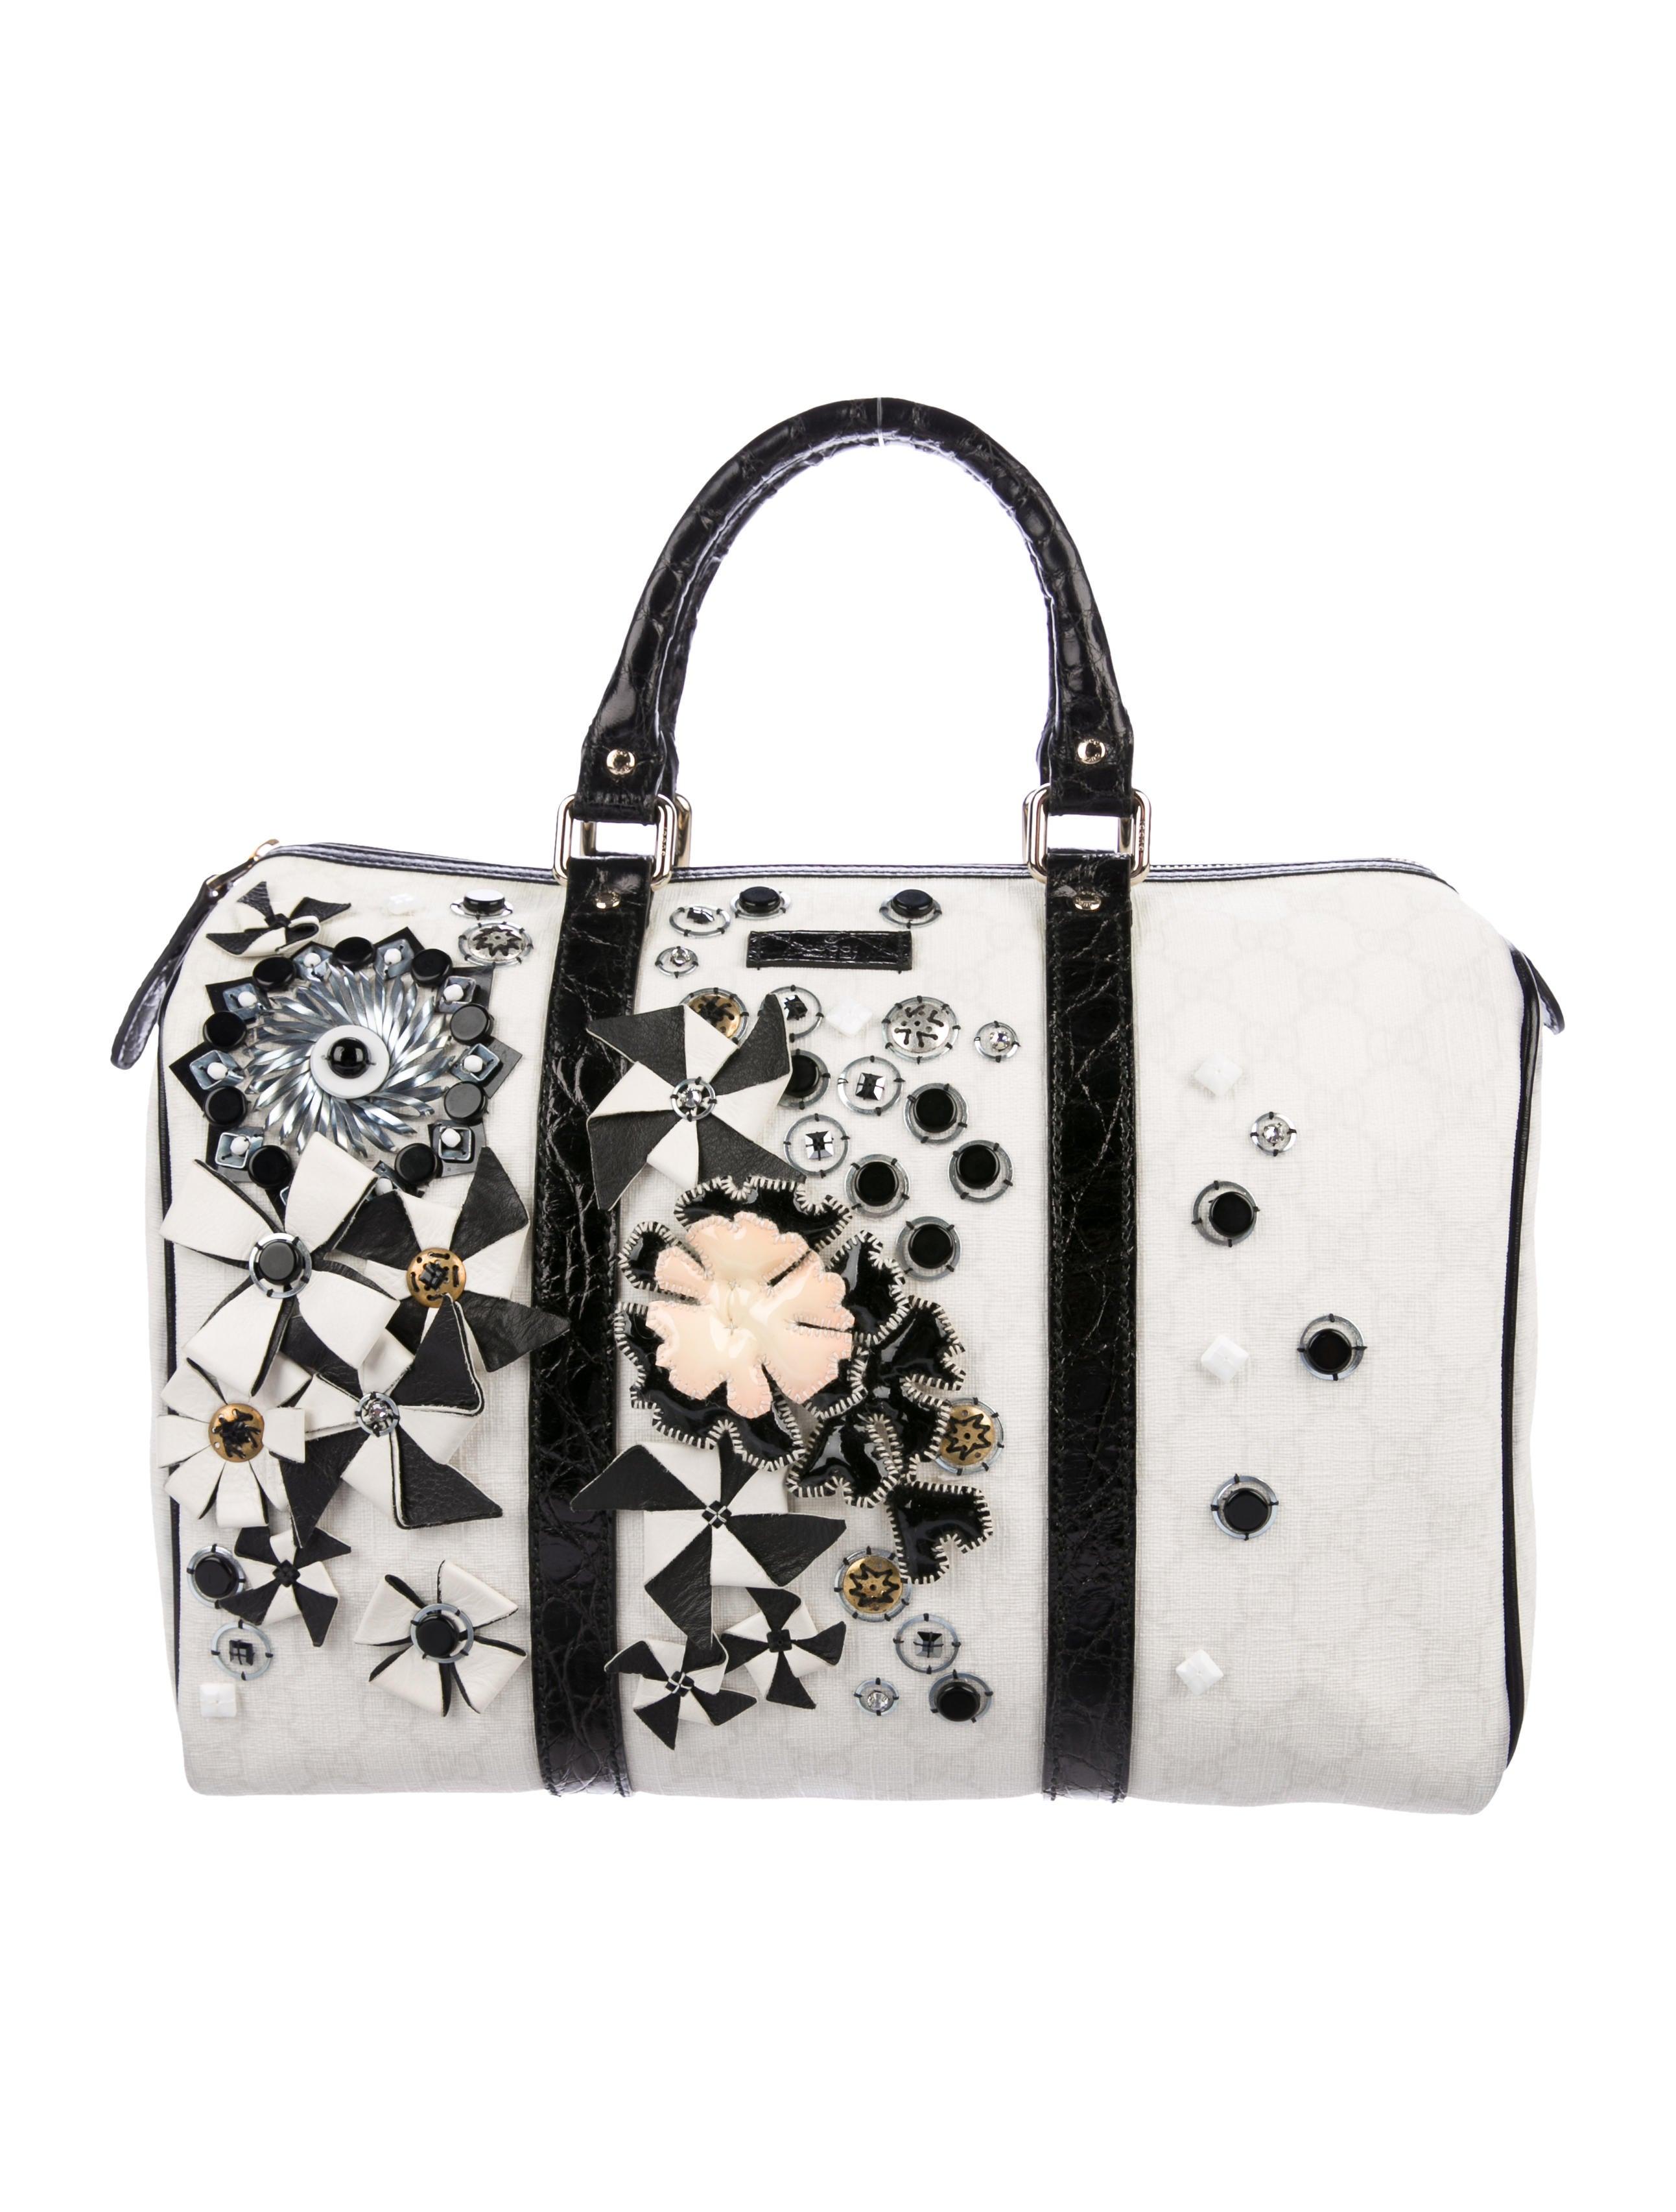 935b41377303 Gucci Embellished Medium Joy Boston Bag - Handbags - GUC203765 | The ...